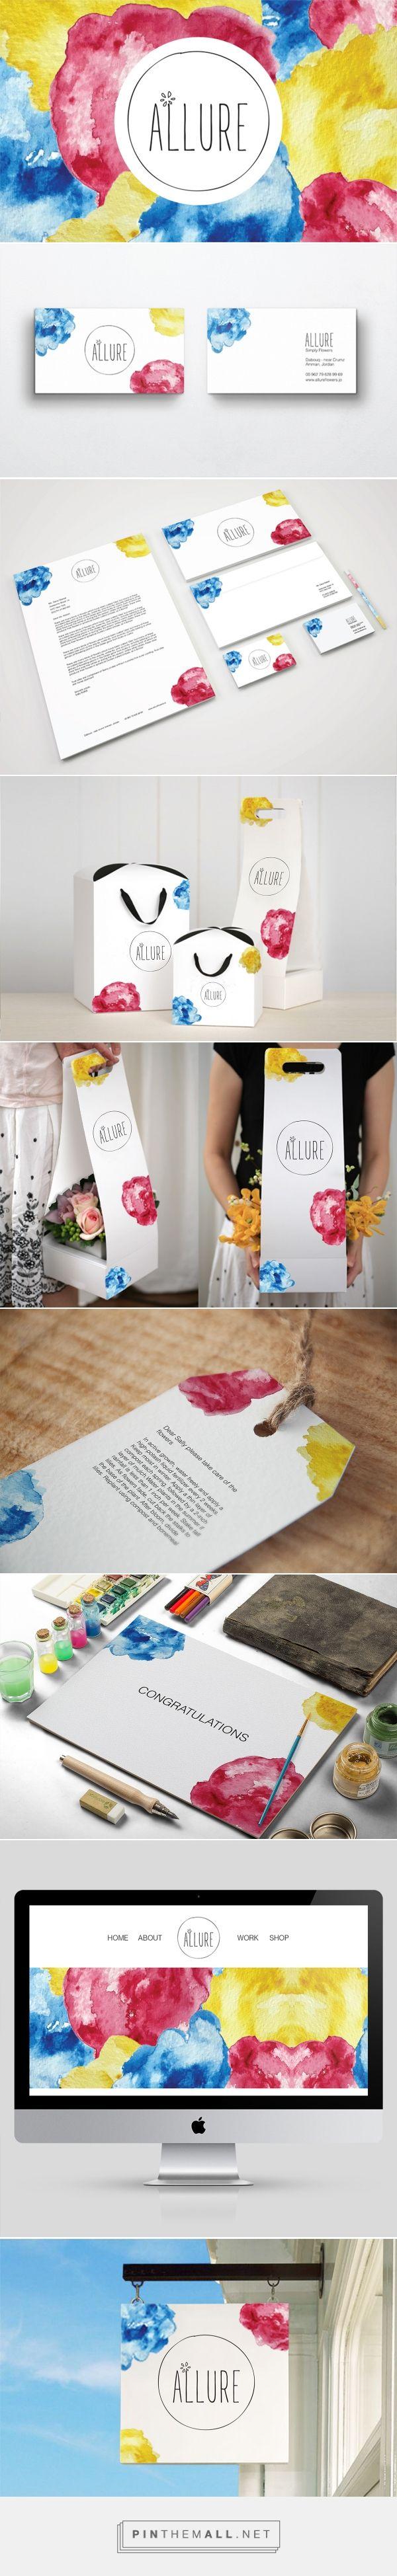 Allure Flower Shop Branding by Sally Rafidi | Fivestar Branding – Design and Branding Agency & Inspiration Gallery